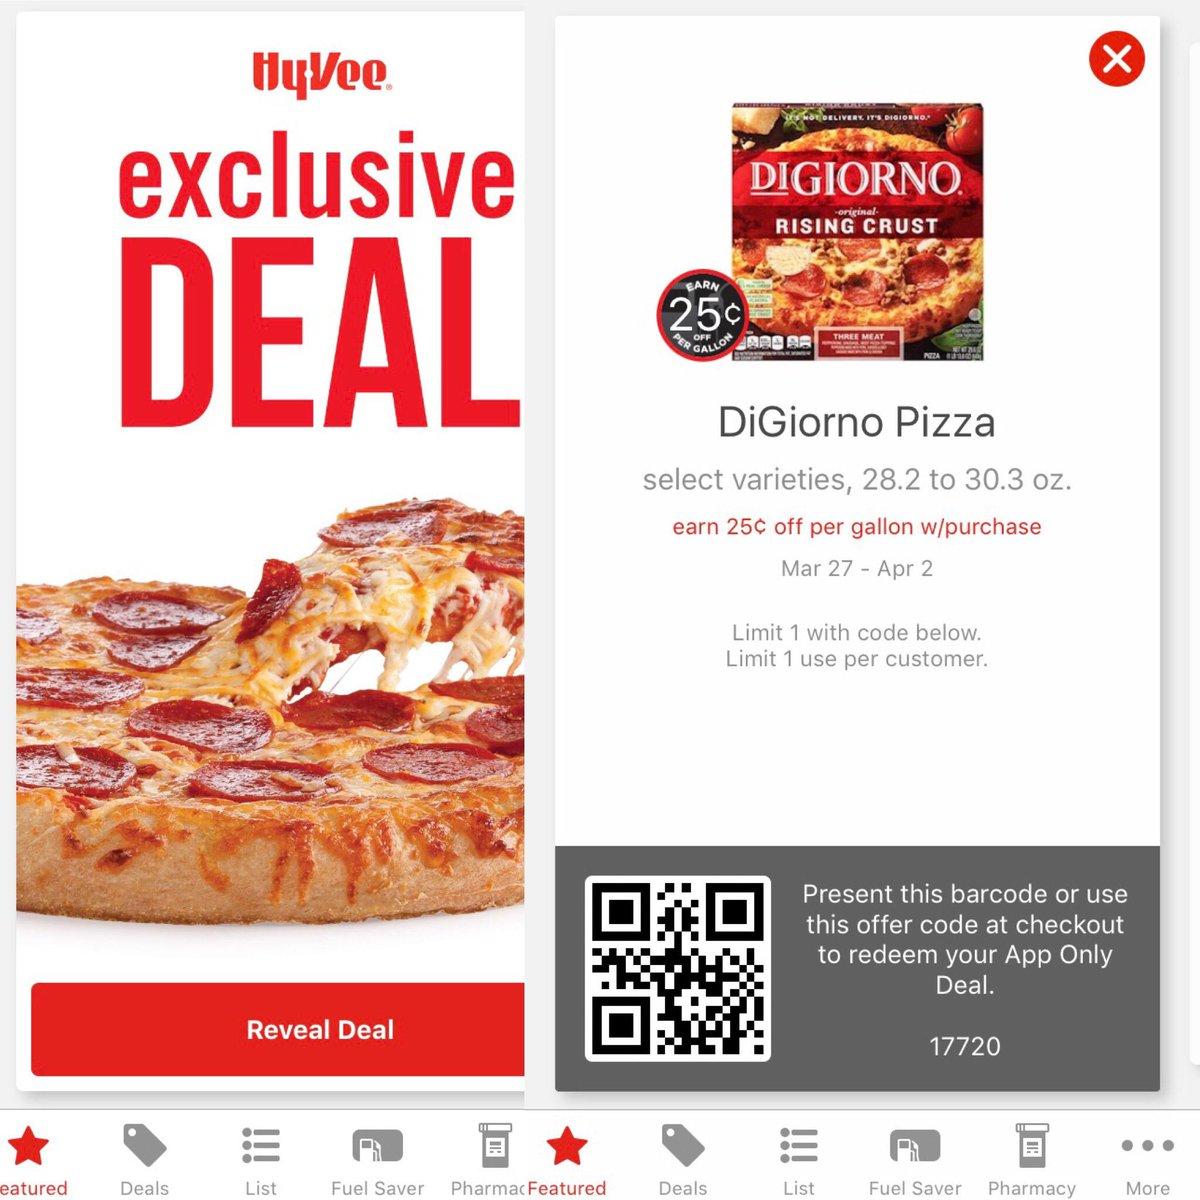 Happy Monday! Earn a 25¢ Fuel Saver when you purchase a DiGiorno Pizza...